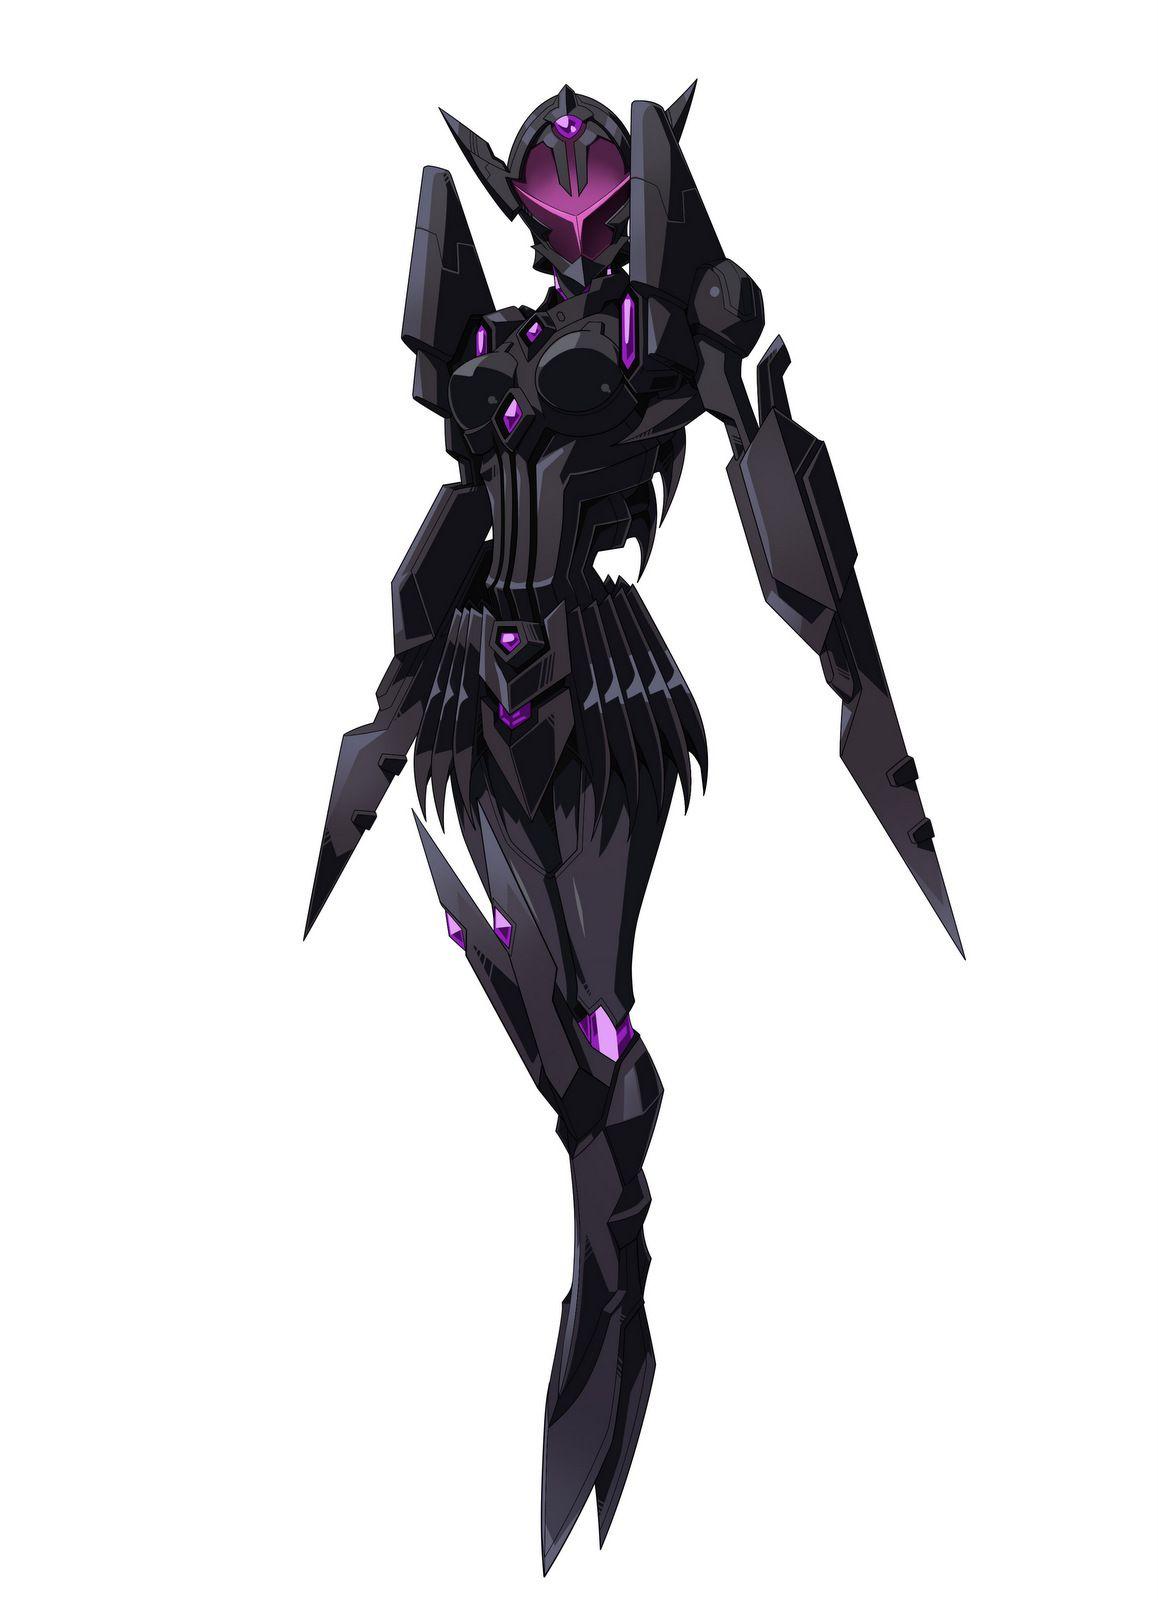 Accel World vs. Sword Art Online: Millennium Twilight Fiche RPG (reviews, previews, wallpapers ...